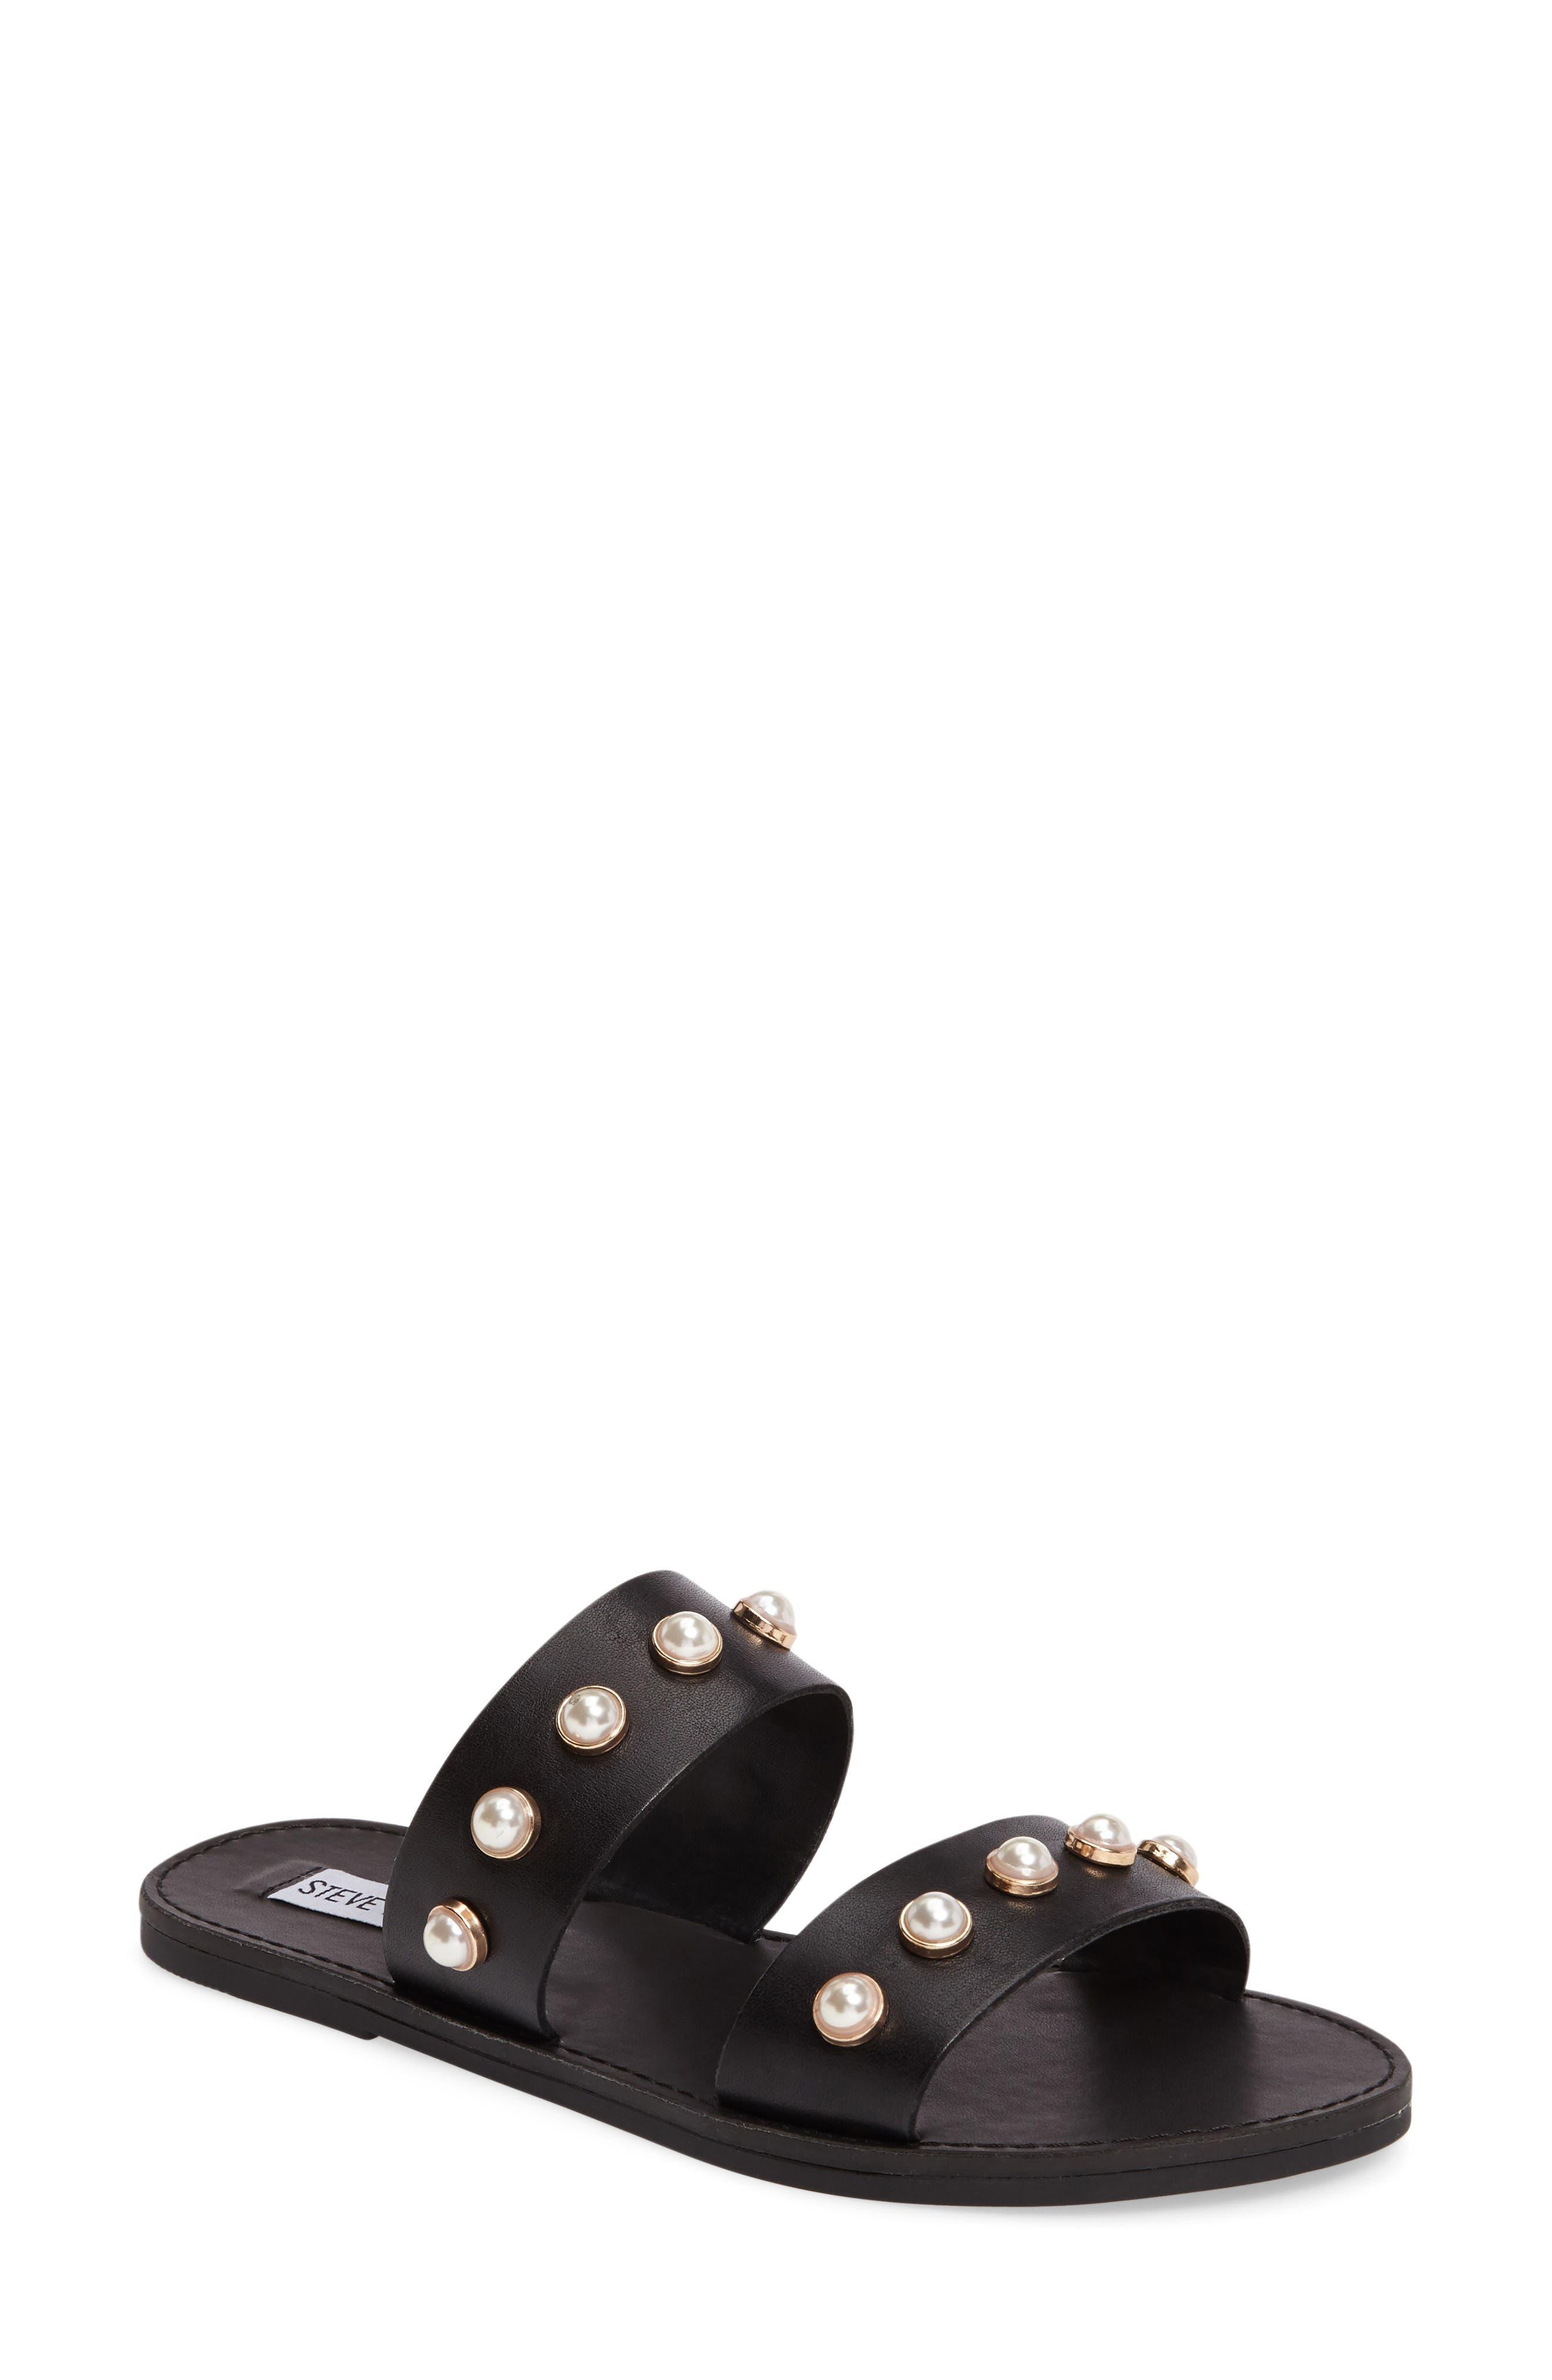 STEVE MADDEN, Jole Embellished Slide Sandal, Main thumbnail 1, color, 001